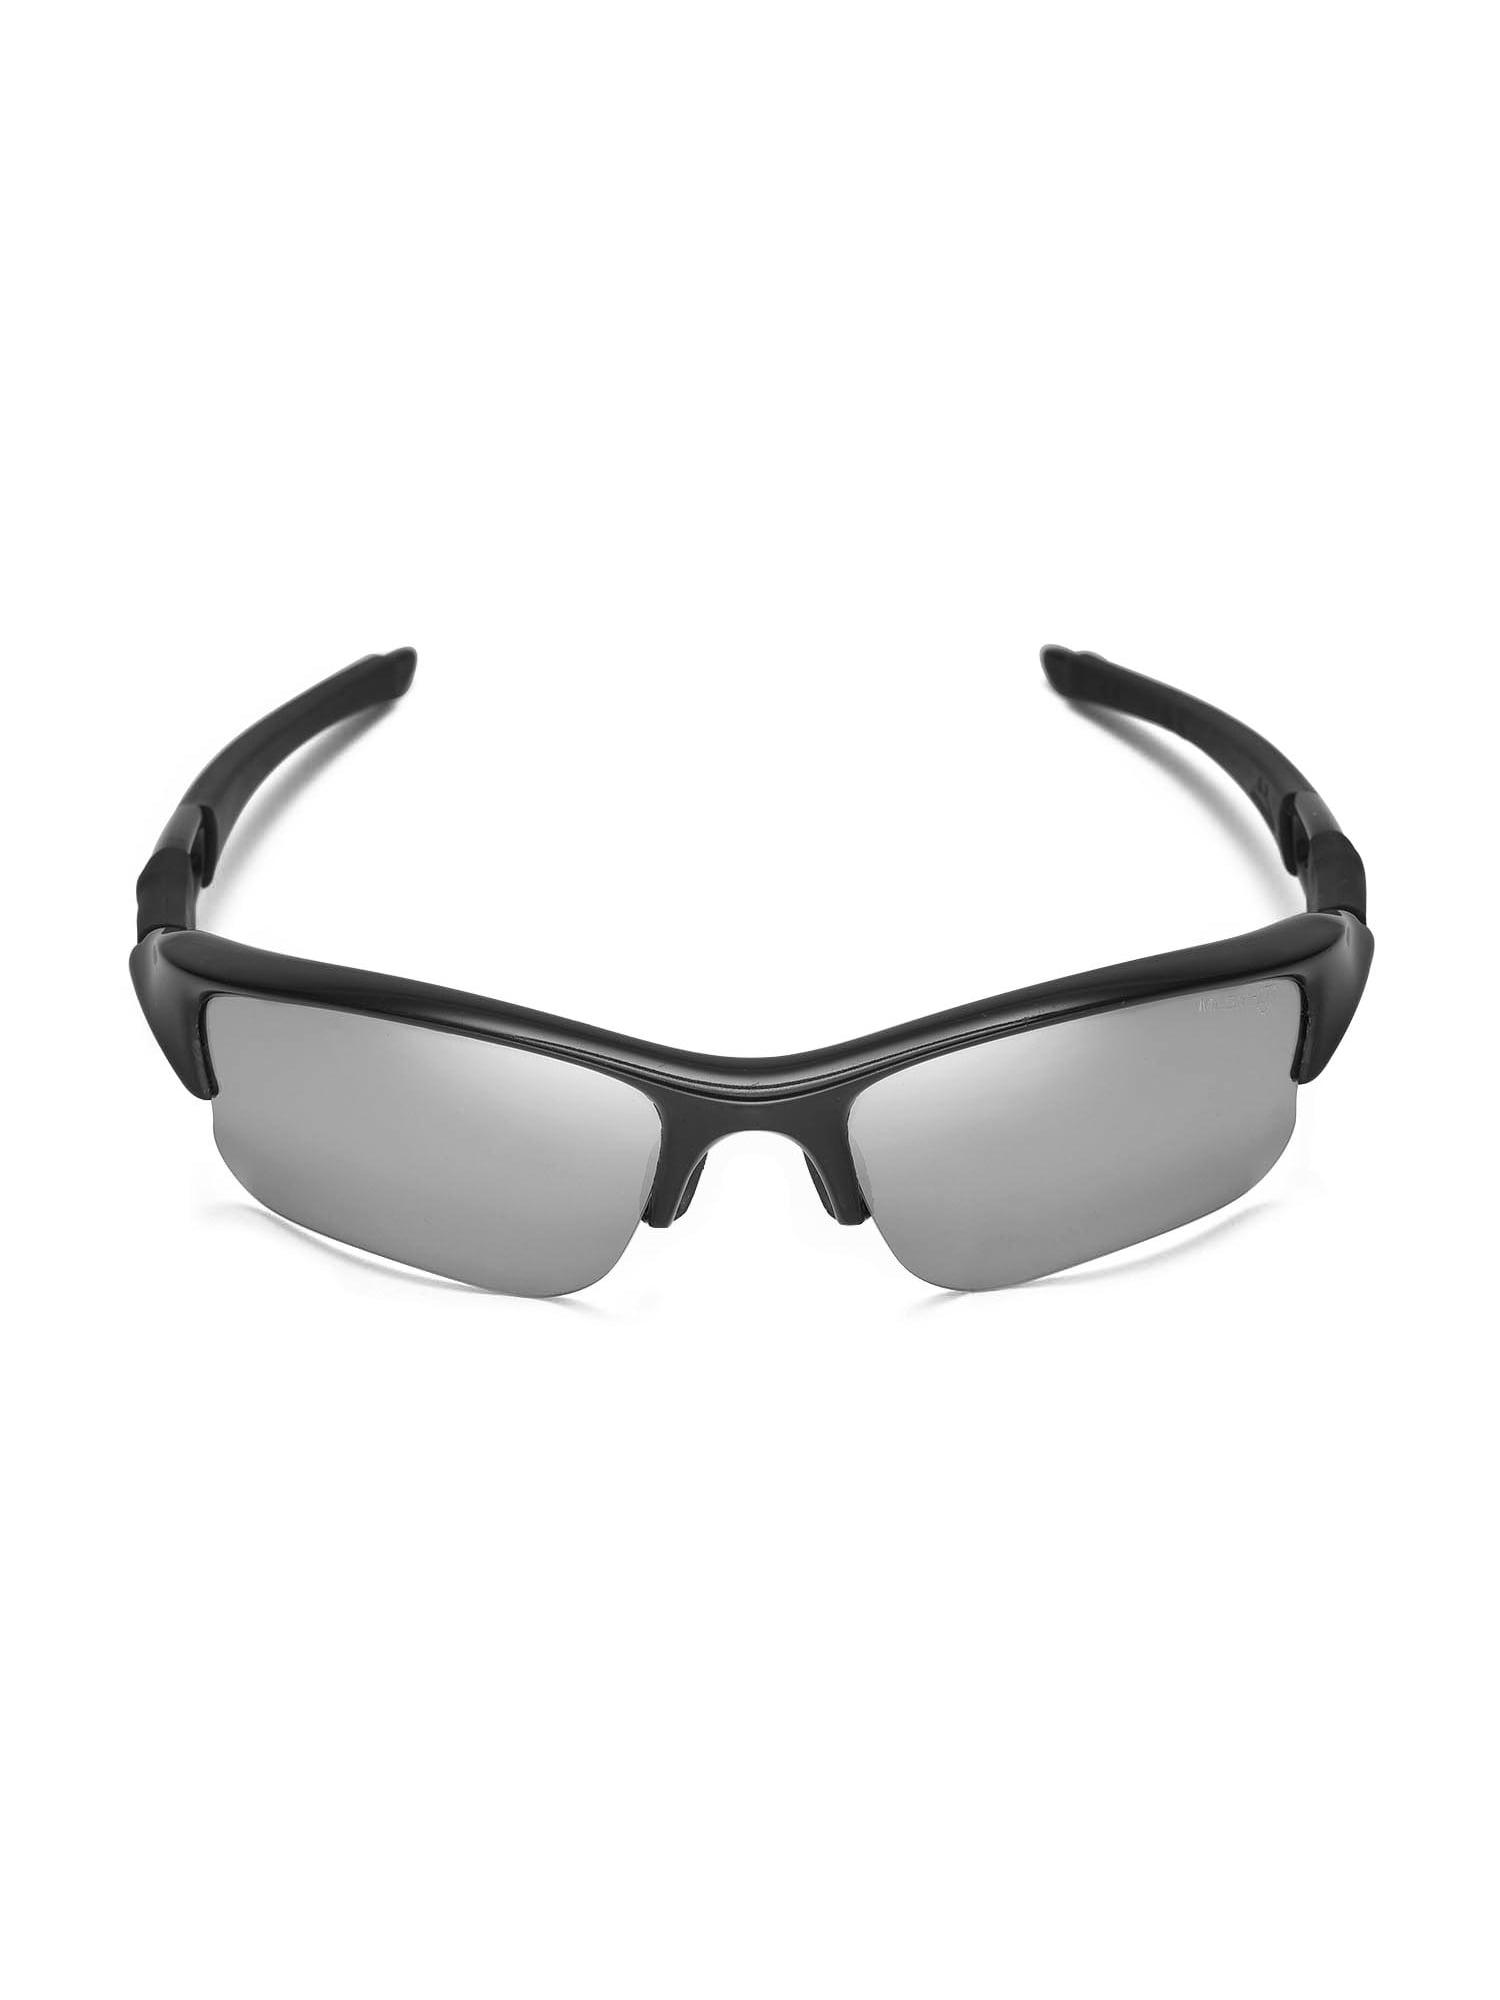 8f3c8247ec7 Walleva - Walleva Transition Photochromic Polarized Replacement Lenses And  Black Rubber Kit For Oakley Flak Jacket XLJ Sunglasses - Walmart.com